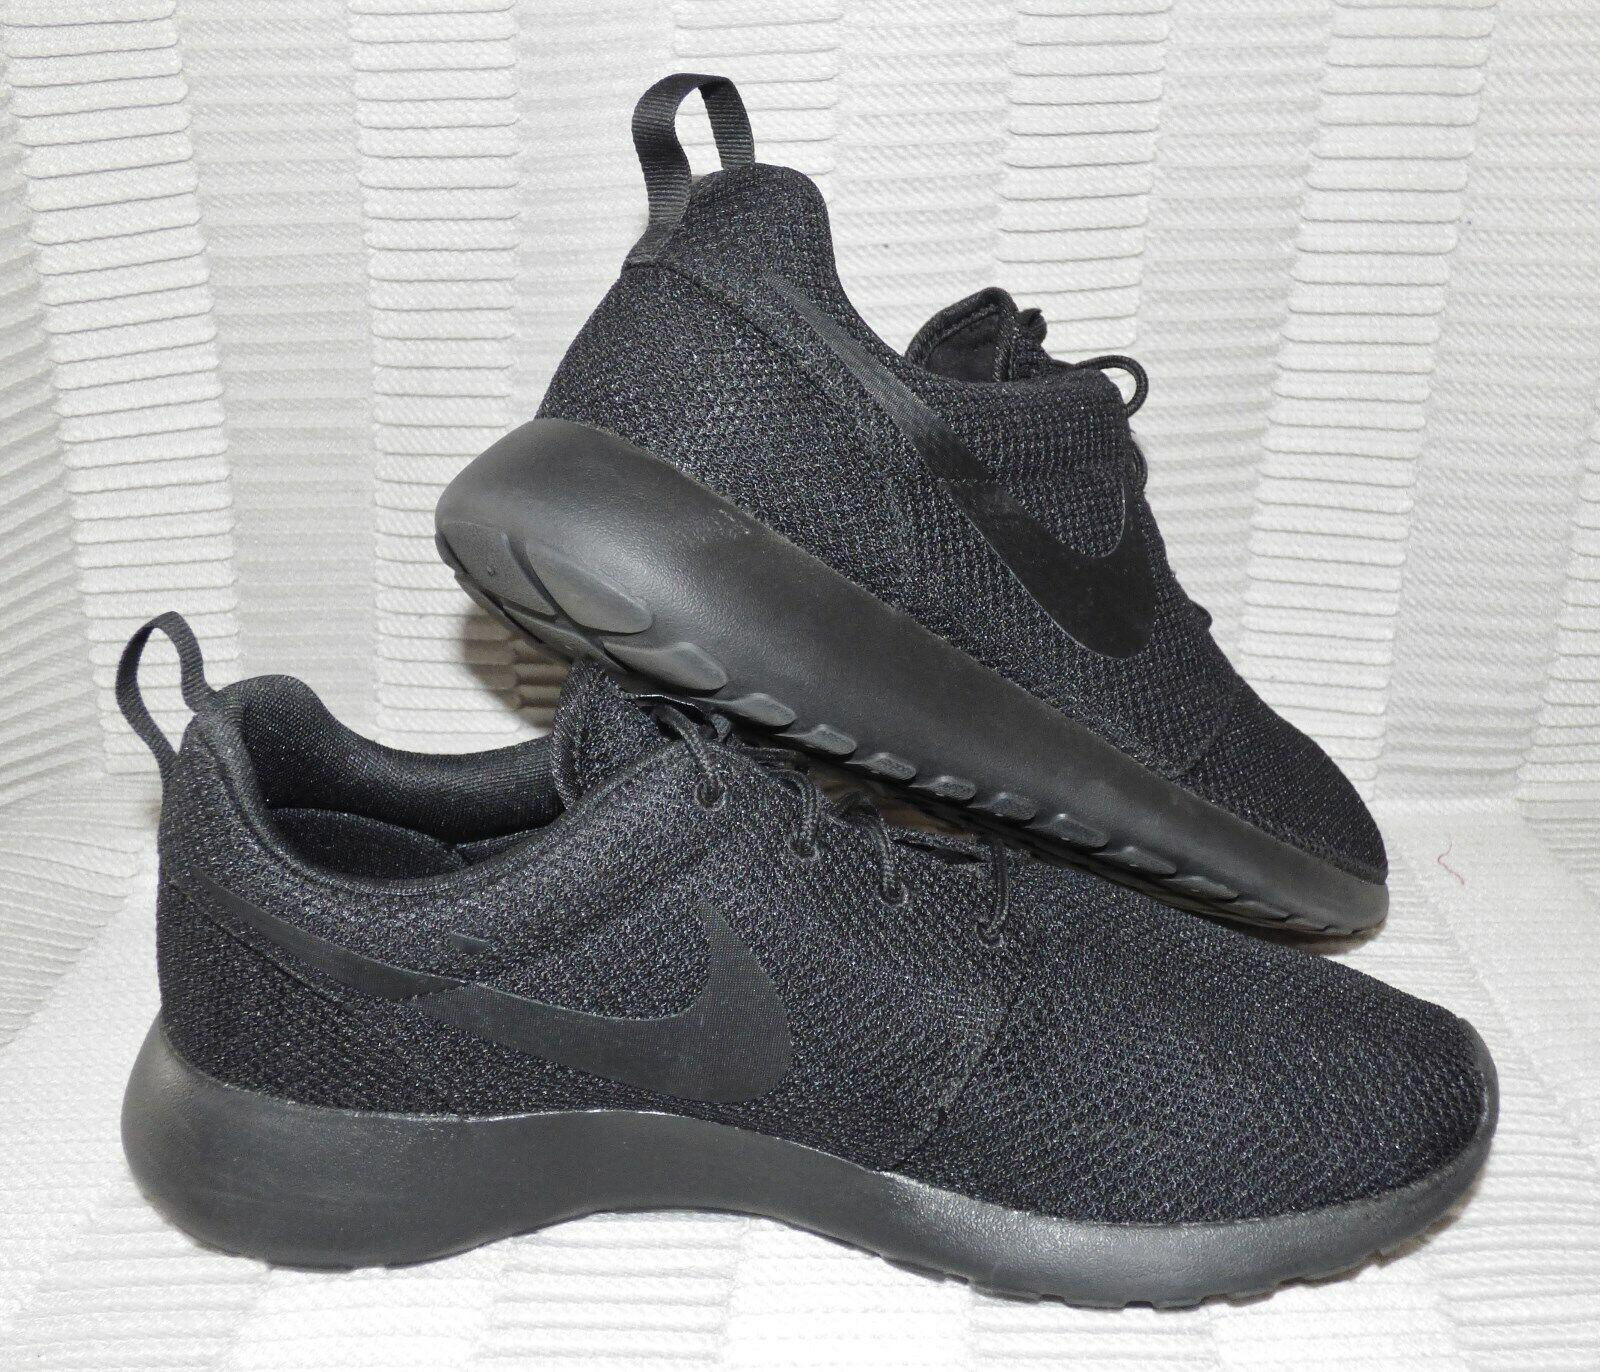 free shipping ec939 86361 MENS MINT NIKE ROSHE ONE MESH BLACK BLACK RUNNING SHOES #511881-026 SIZE  11.5